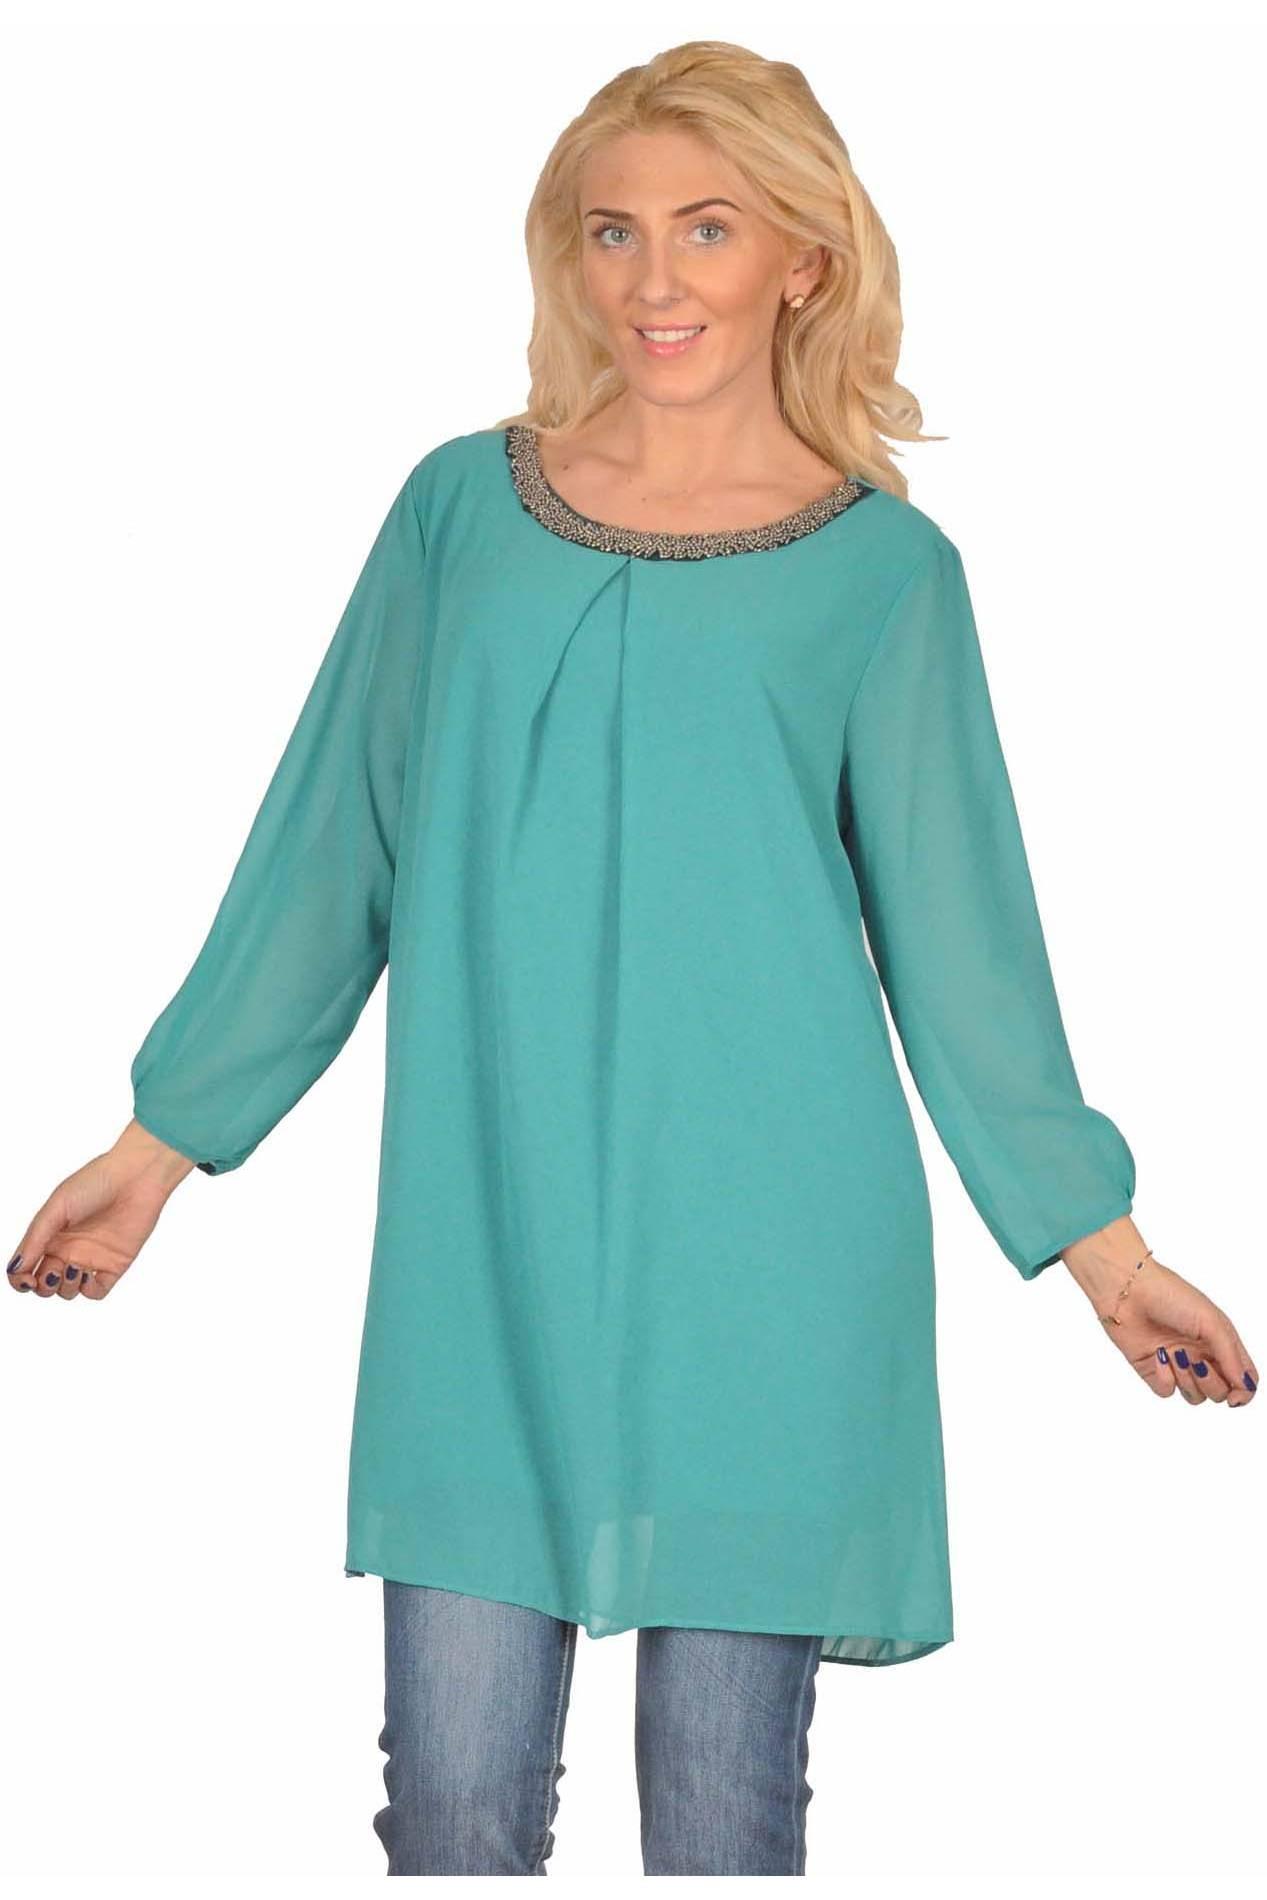 Rochie tunica verde de ocazie cu aplicatii decolteu